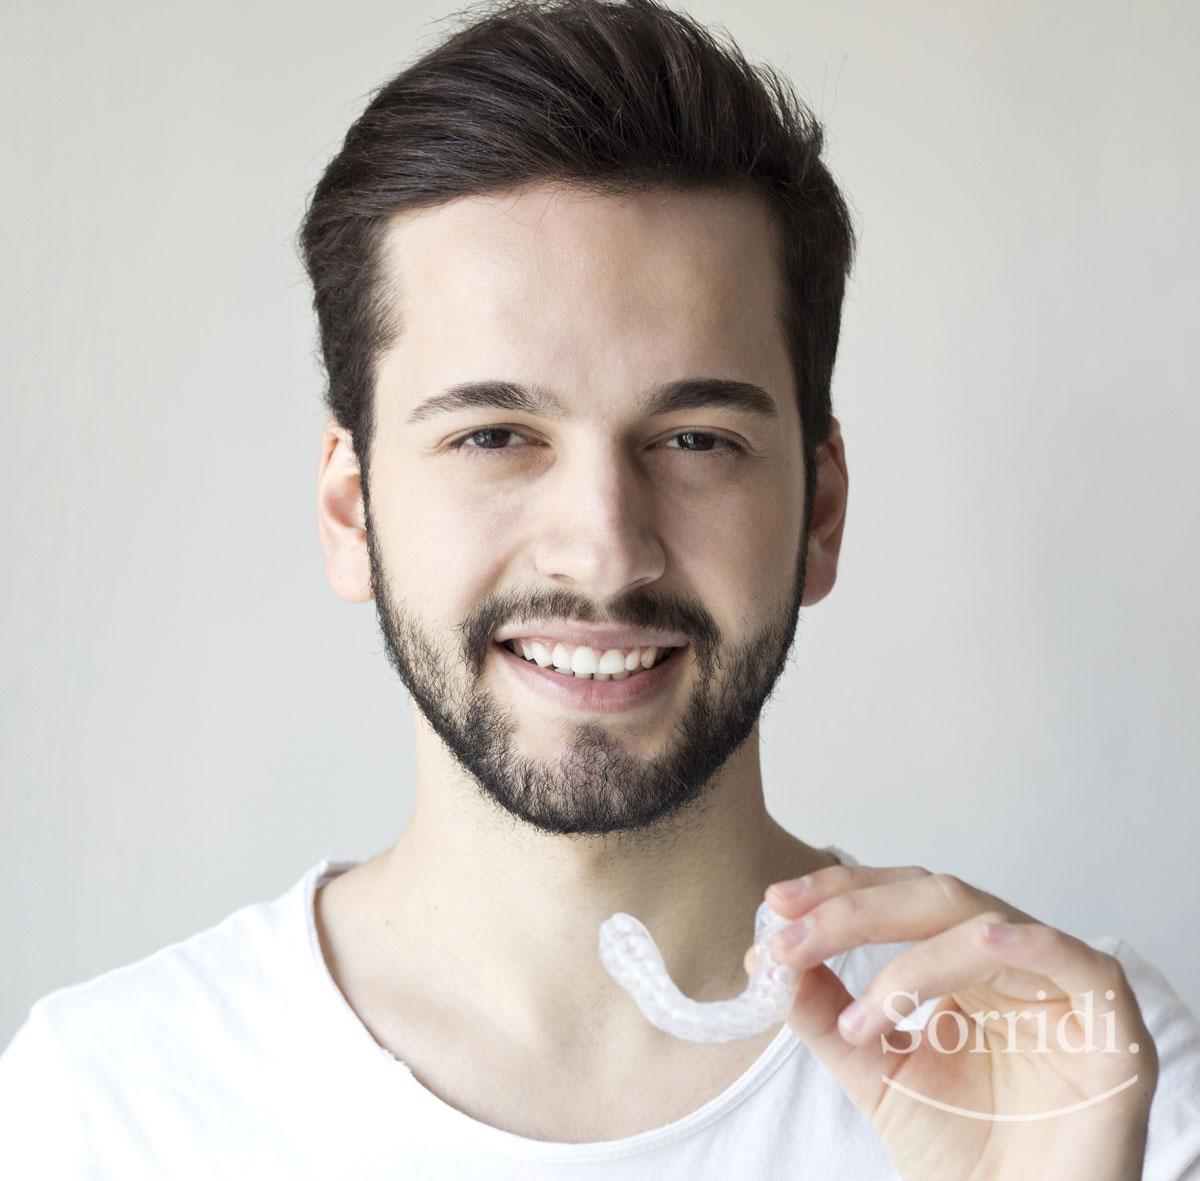 Sorridi-ch-magazine-bite-dentale